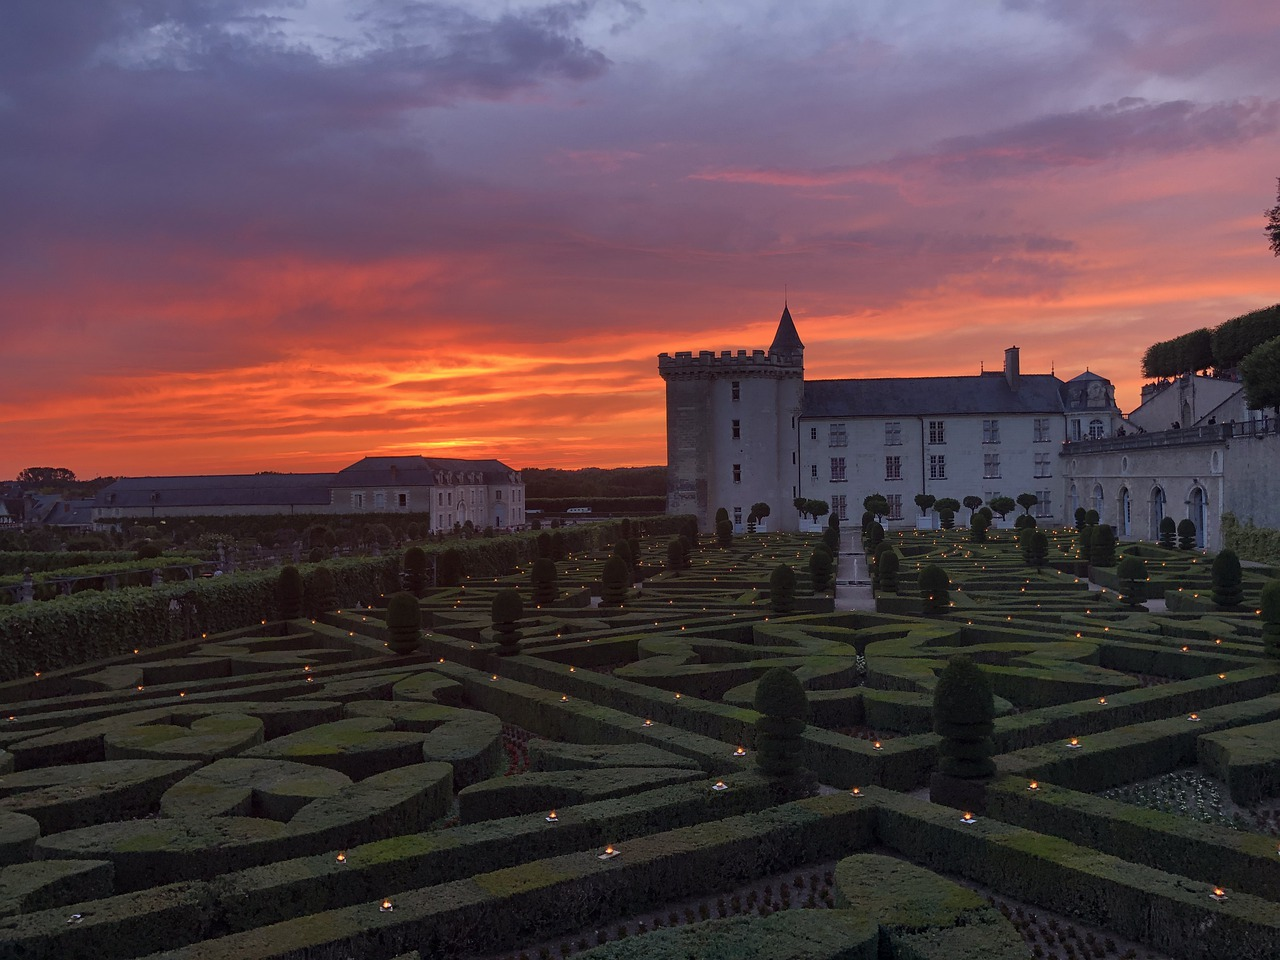 A-la-decouverte-de-la-Loire